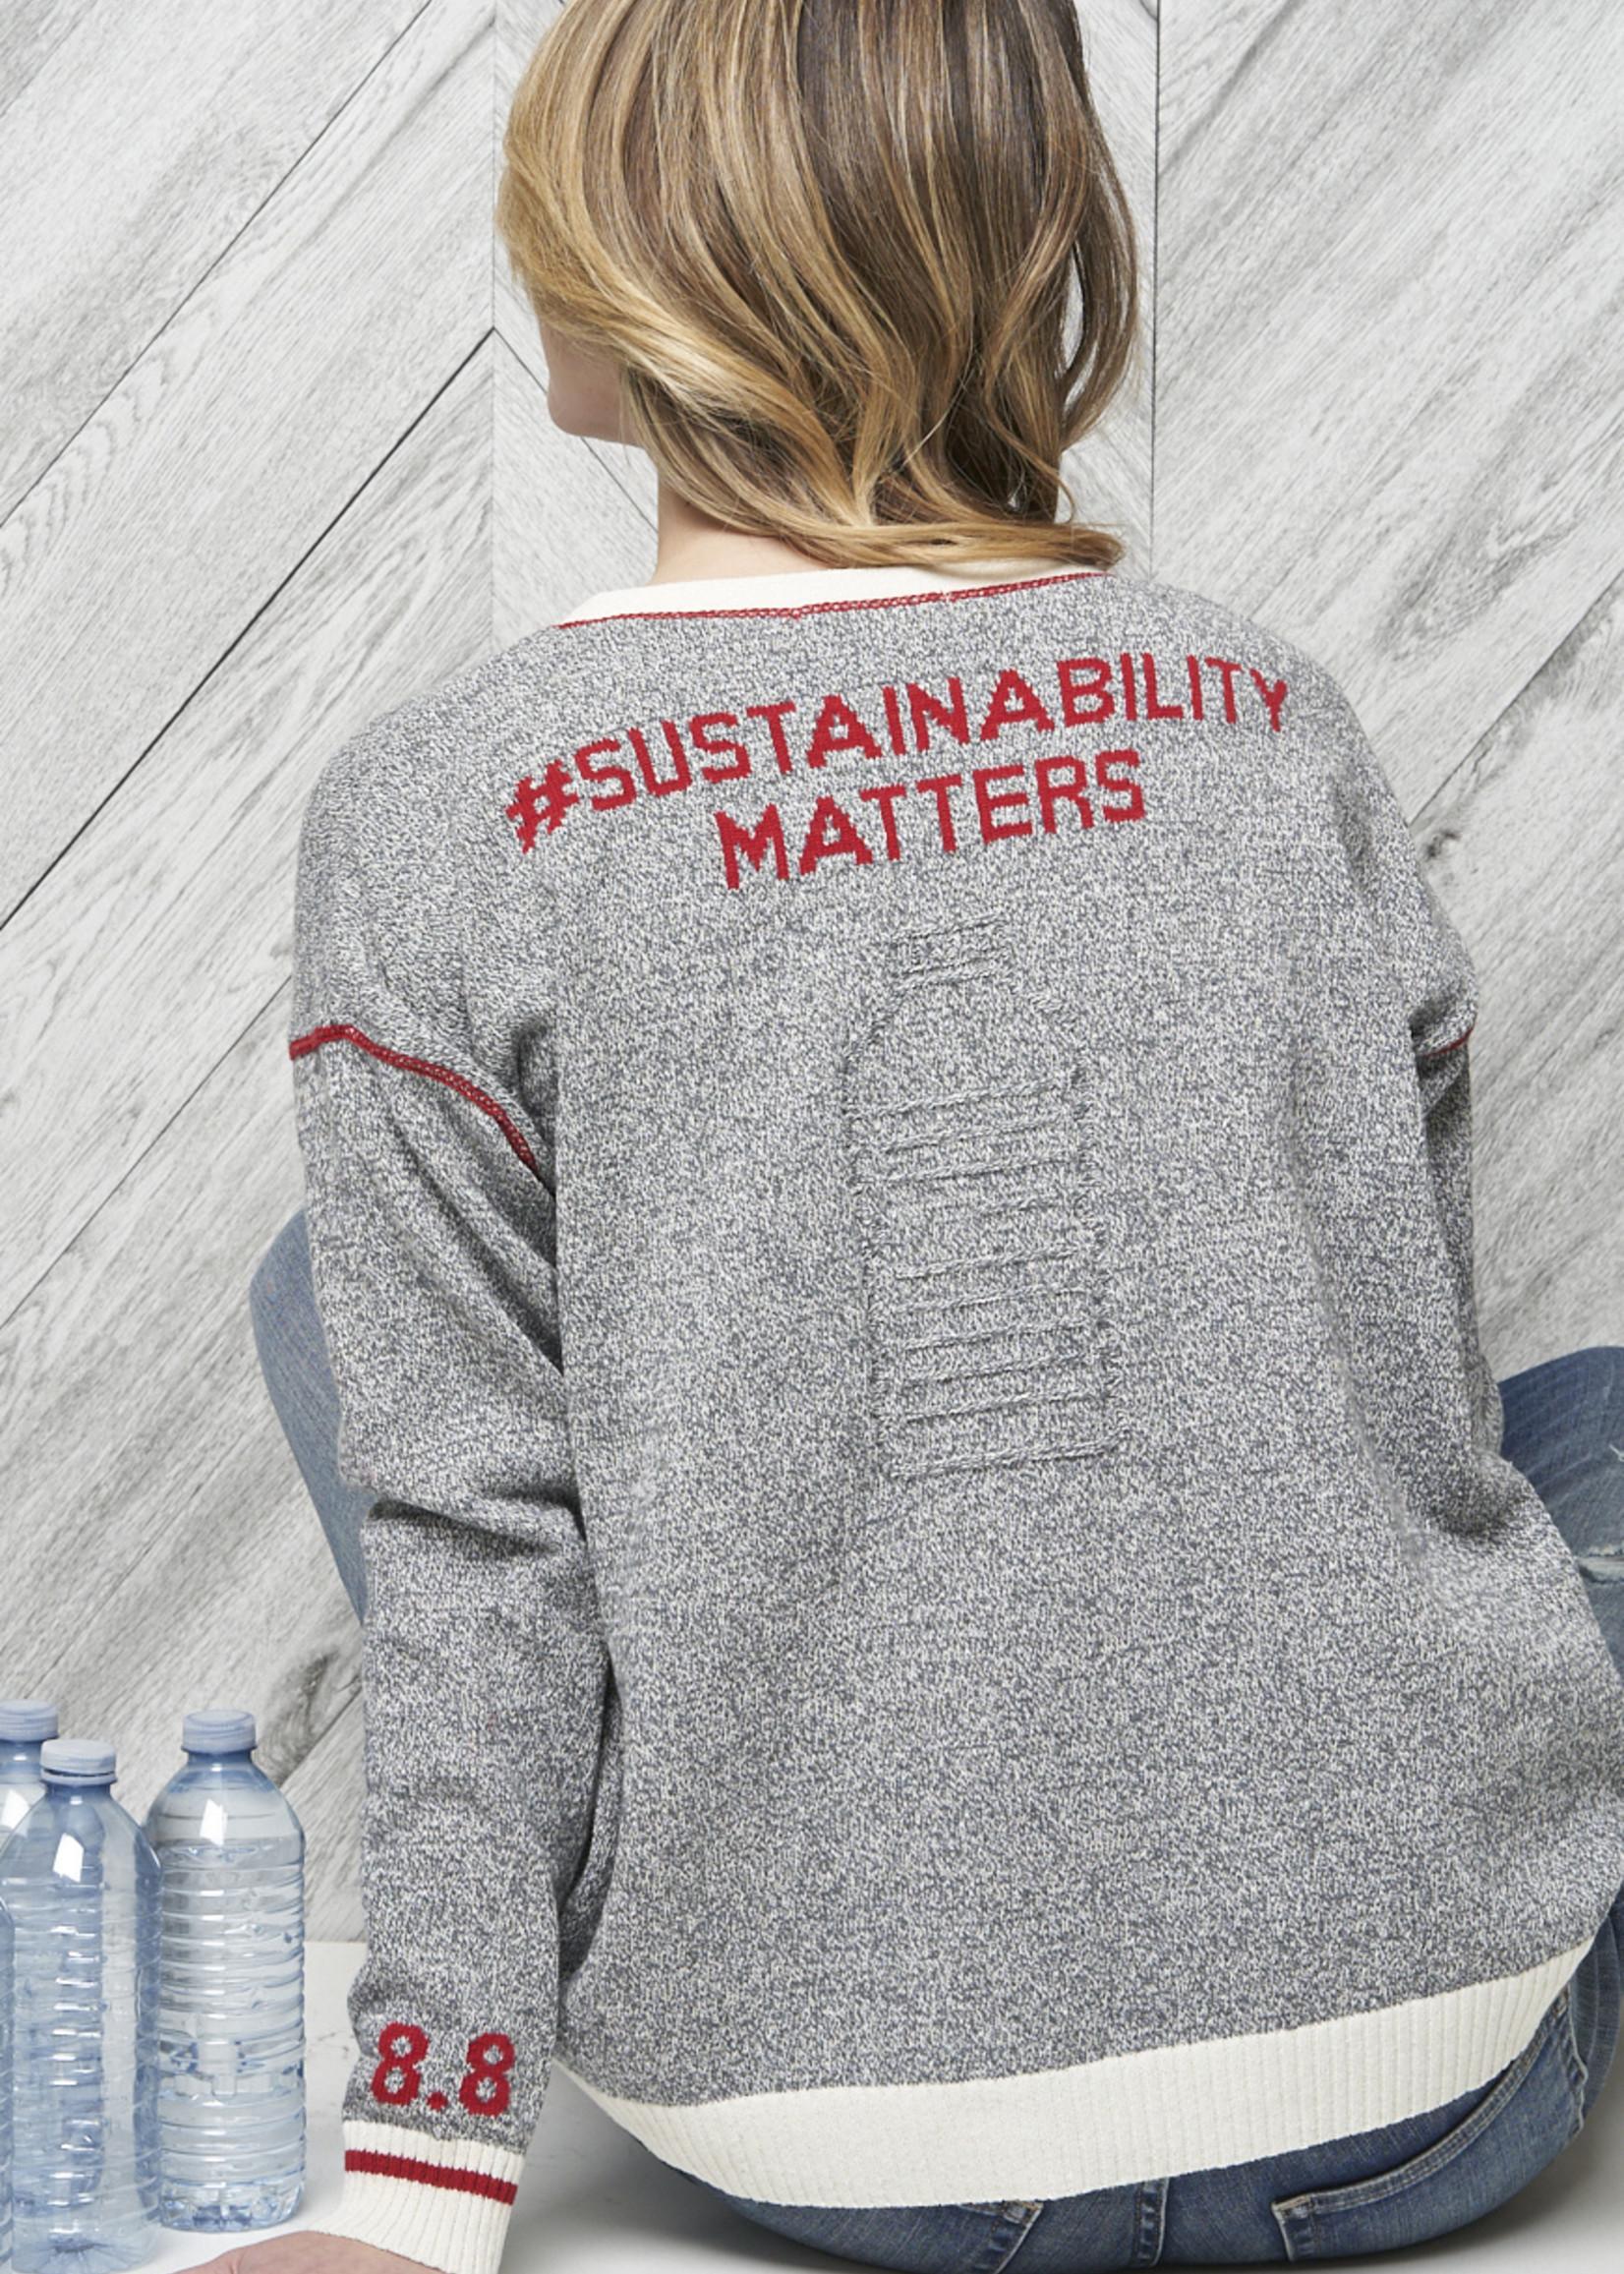 Parkhurst Parkhurst Sustainably Matters  Pullover Sweater